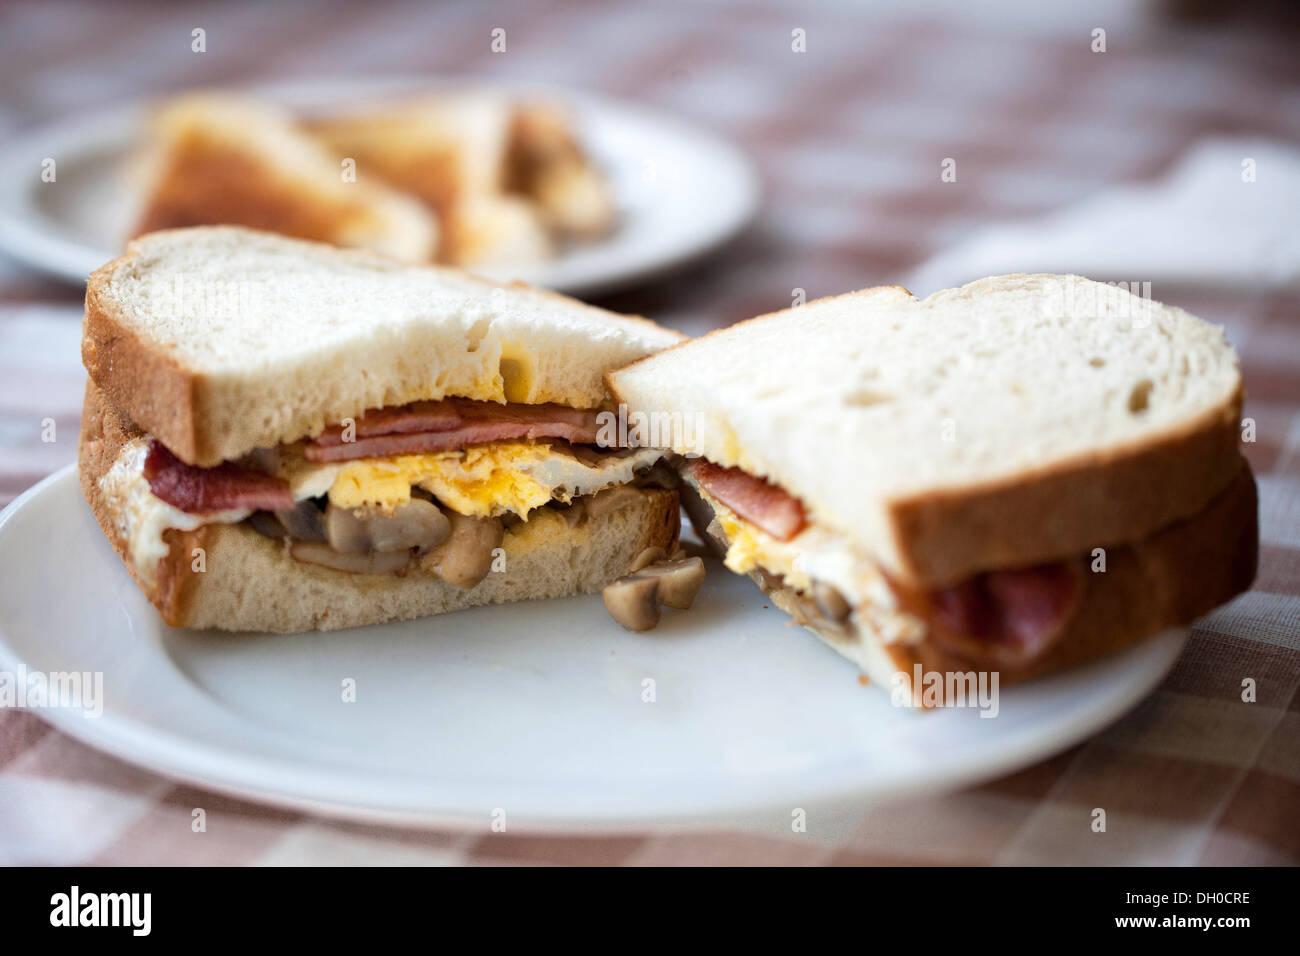 Bacon, egg and mushroom sandwich, British food. - Stock Image